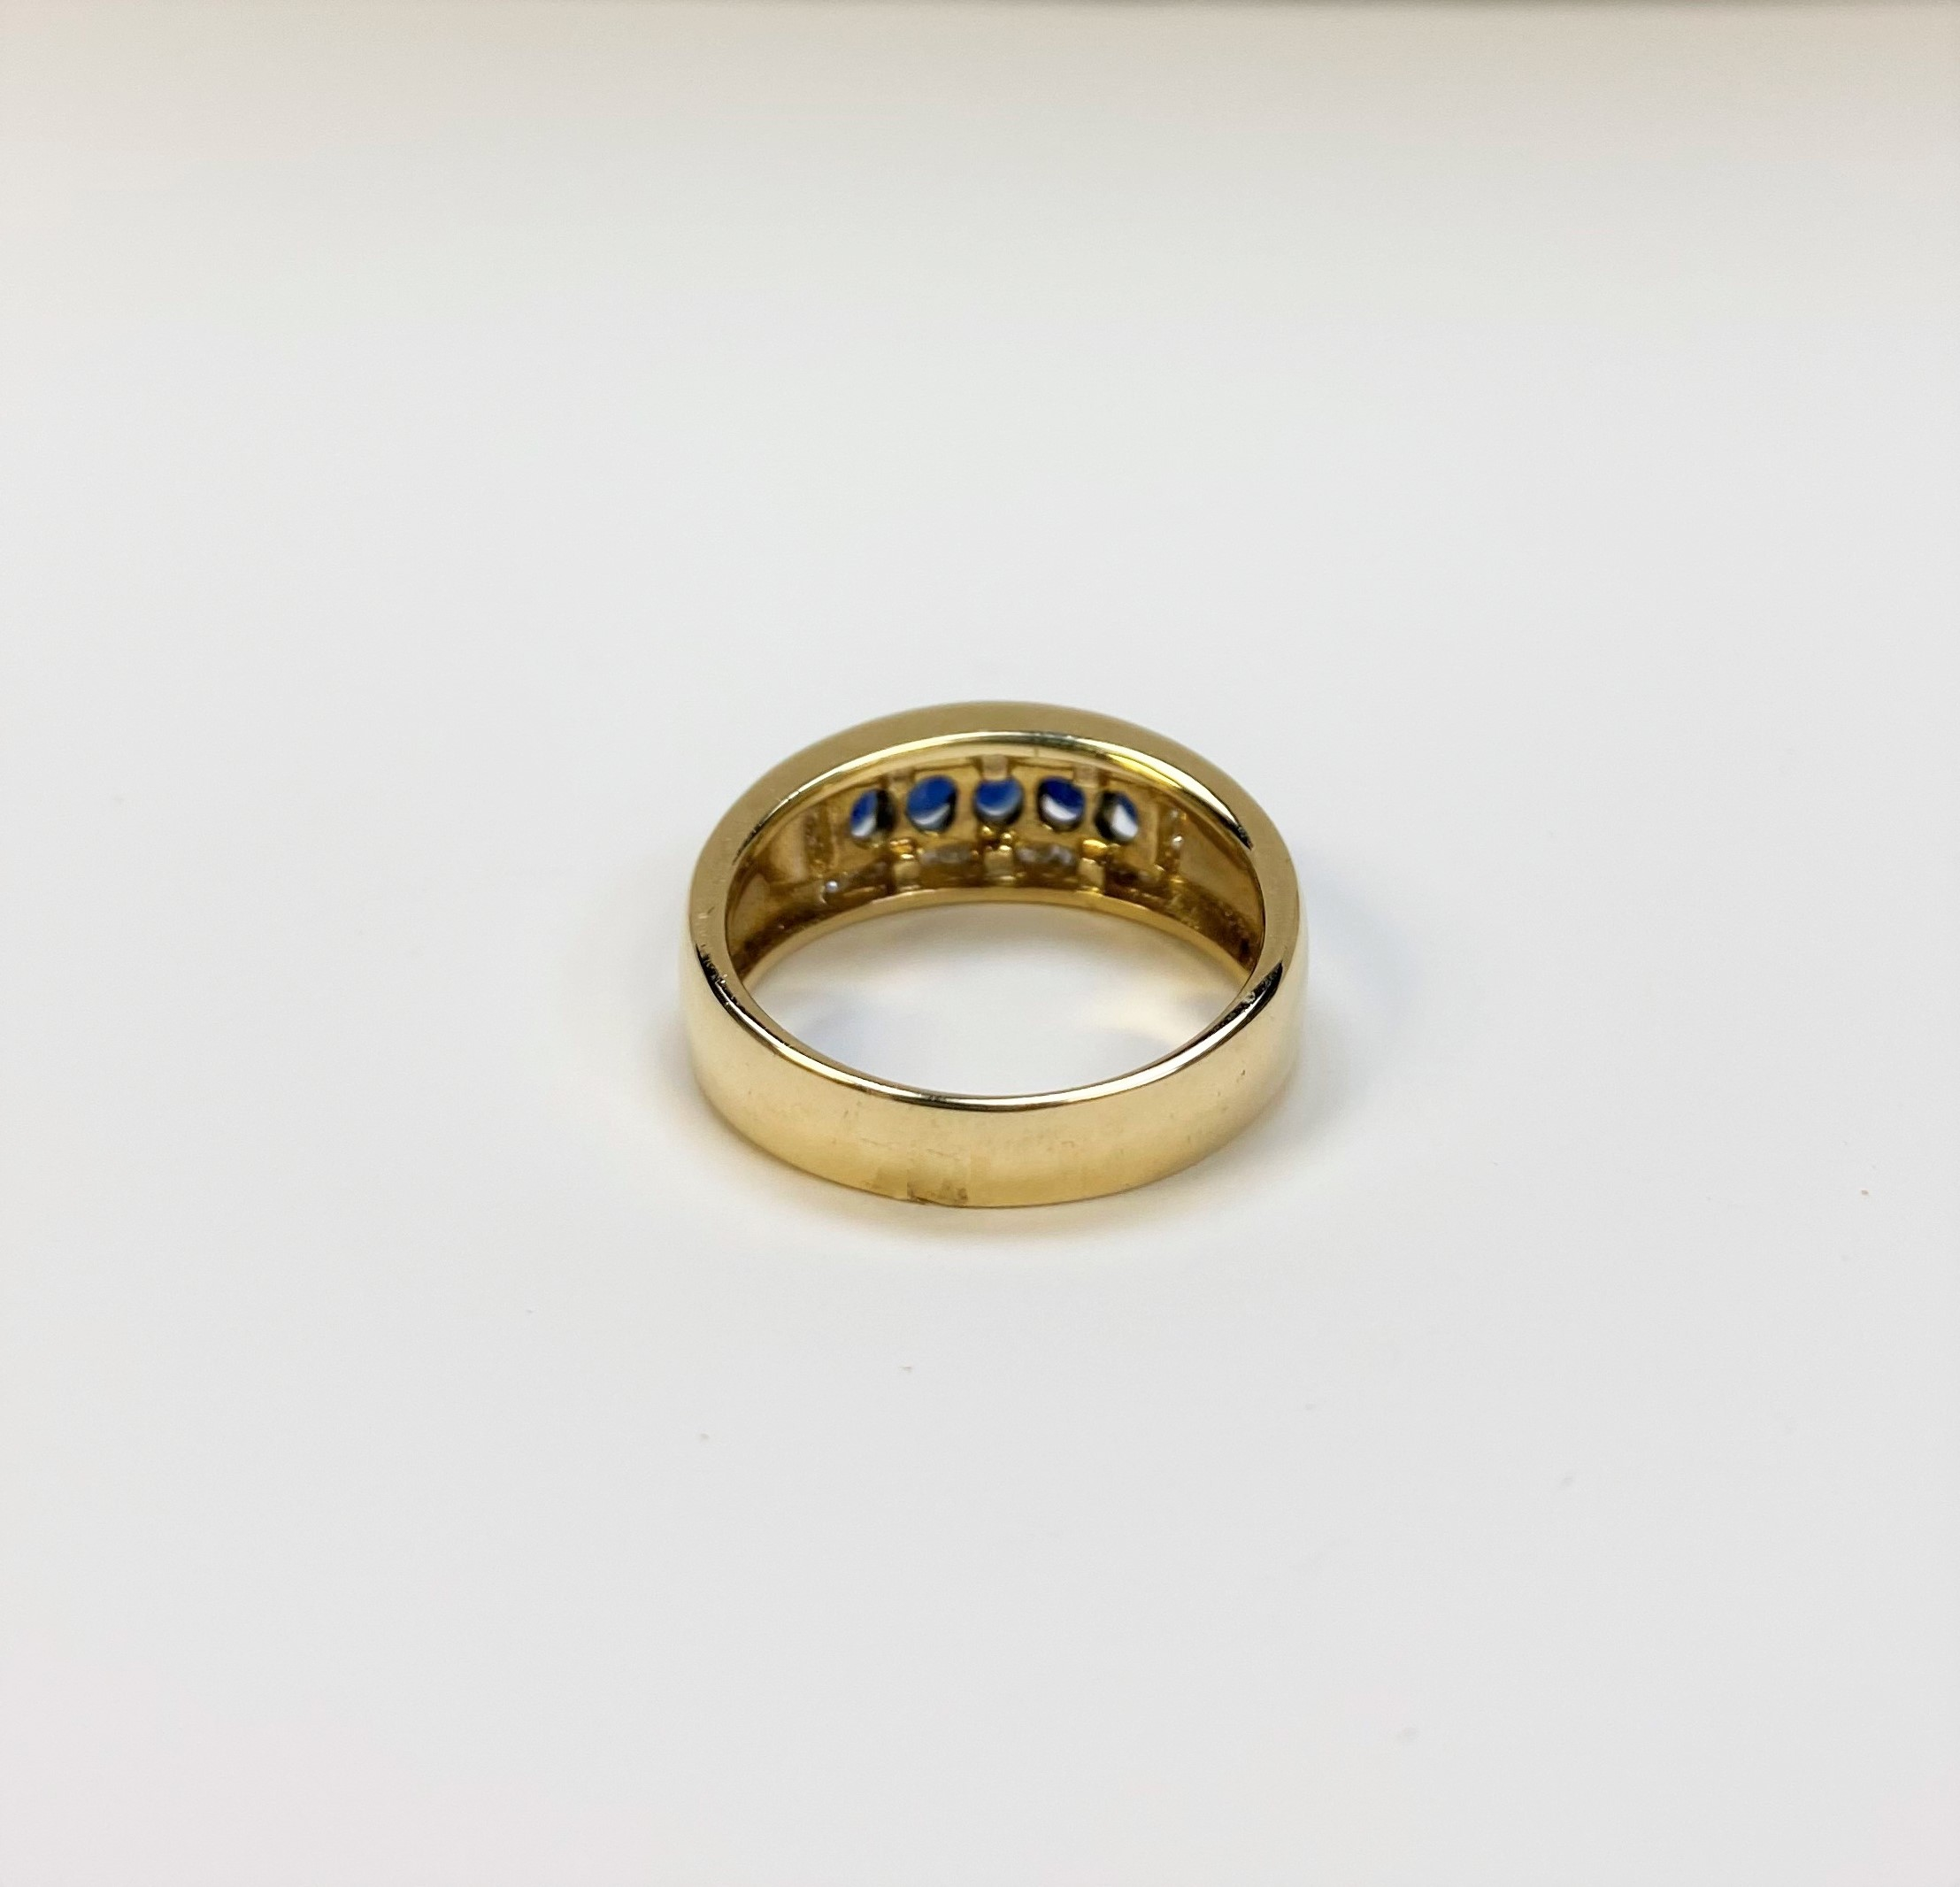 1 Carat Total Weight Sapphire Diamond Ring